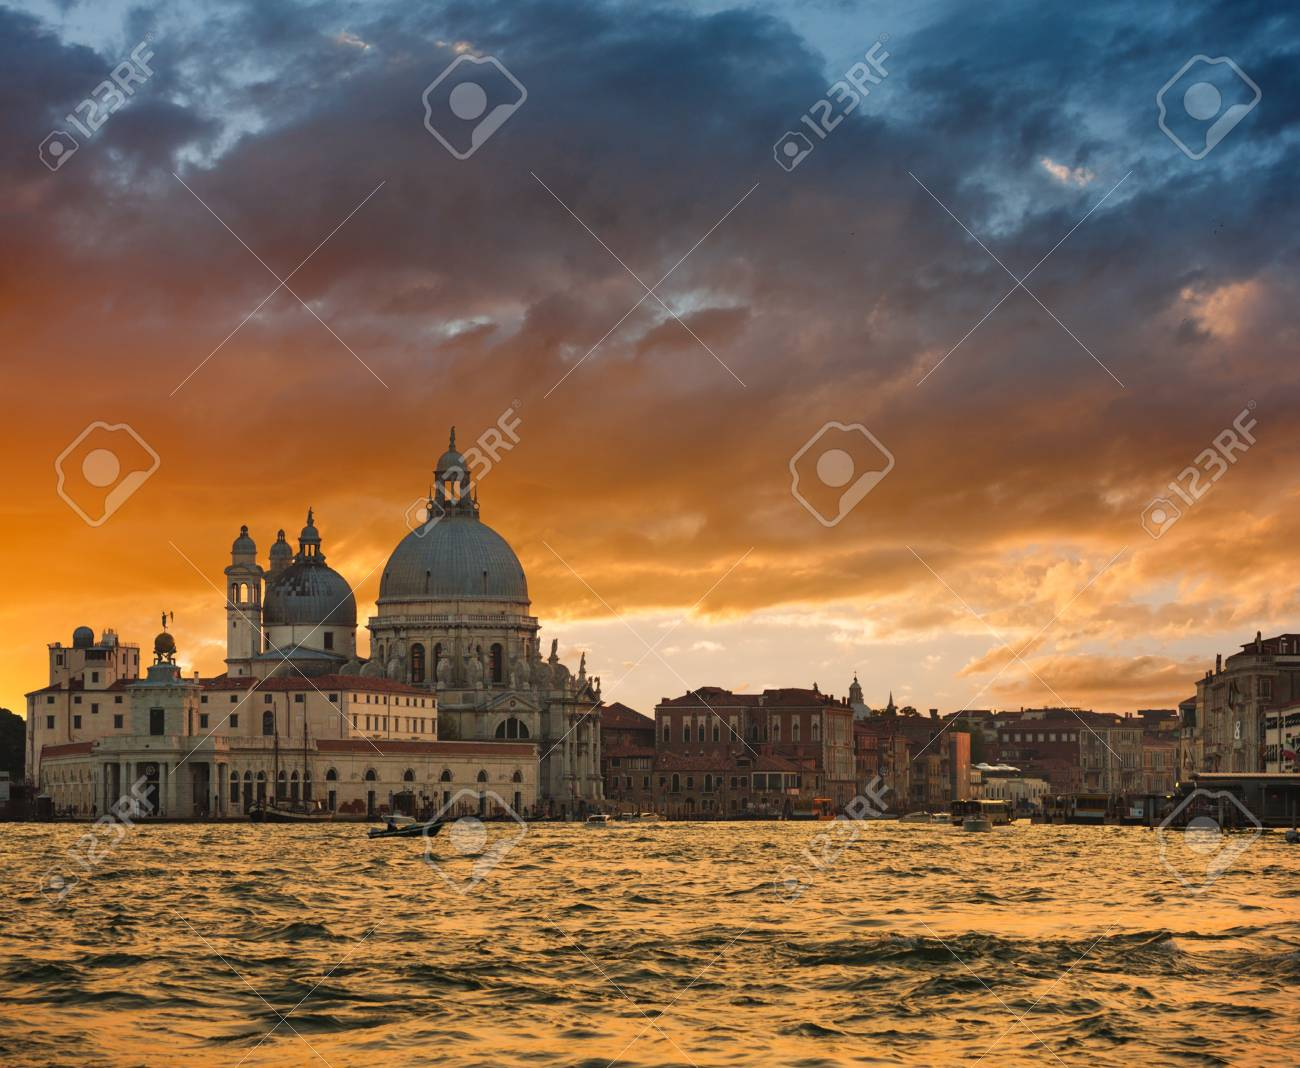 Gorgeous sunset over Grand Canal and Basilica Santa Maria della Salute, Venice, Italy Stock Photo - 18078559